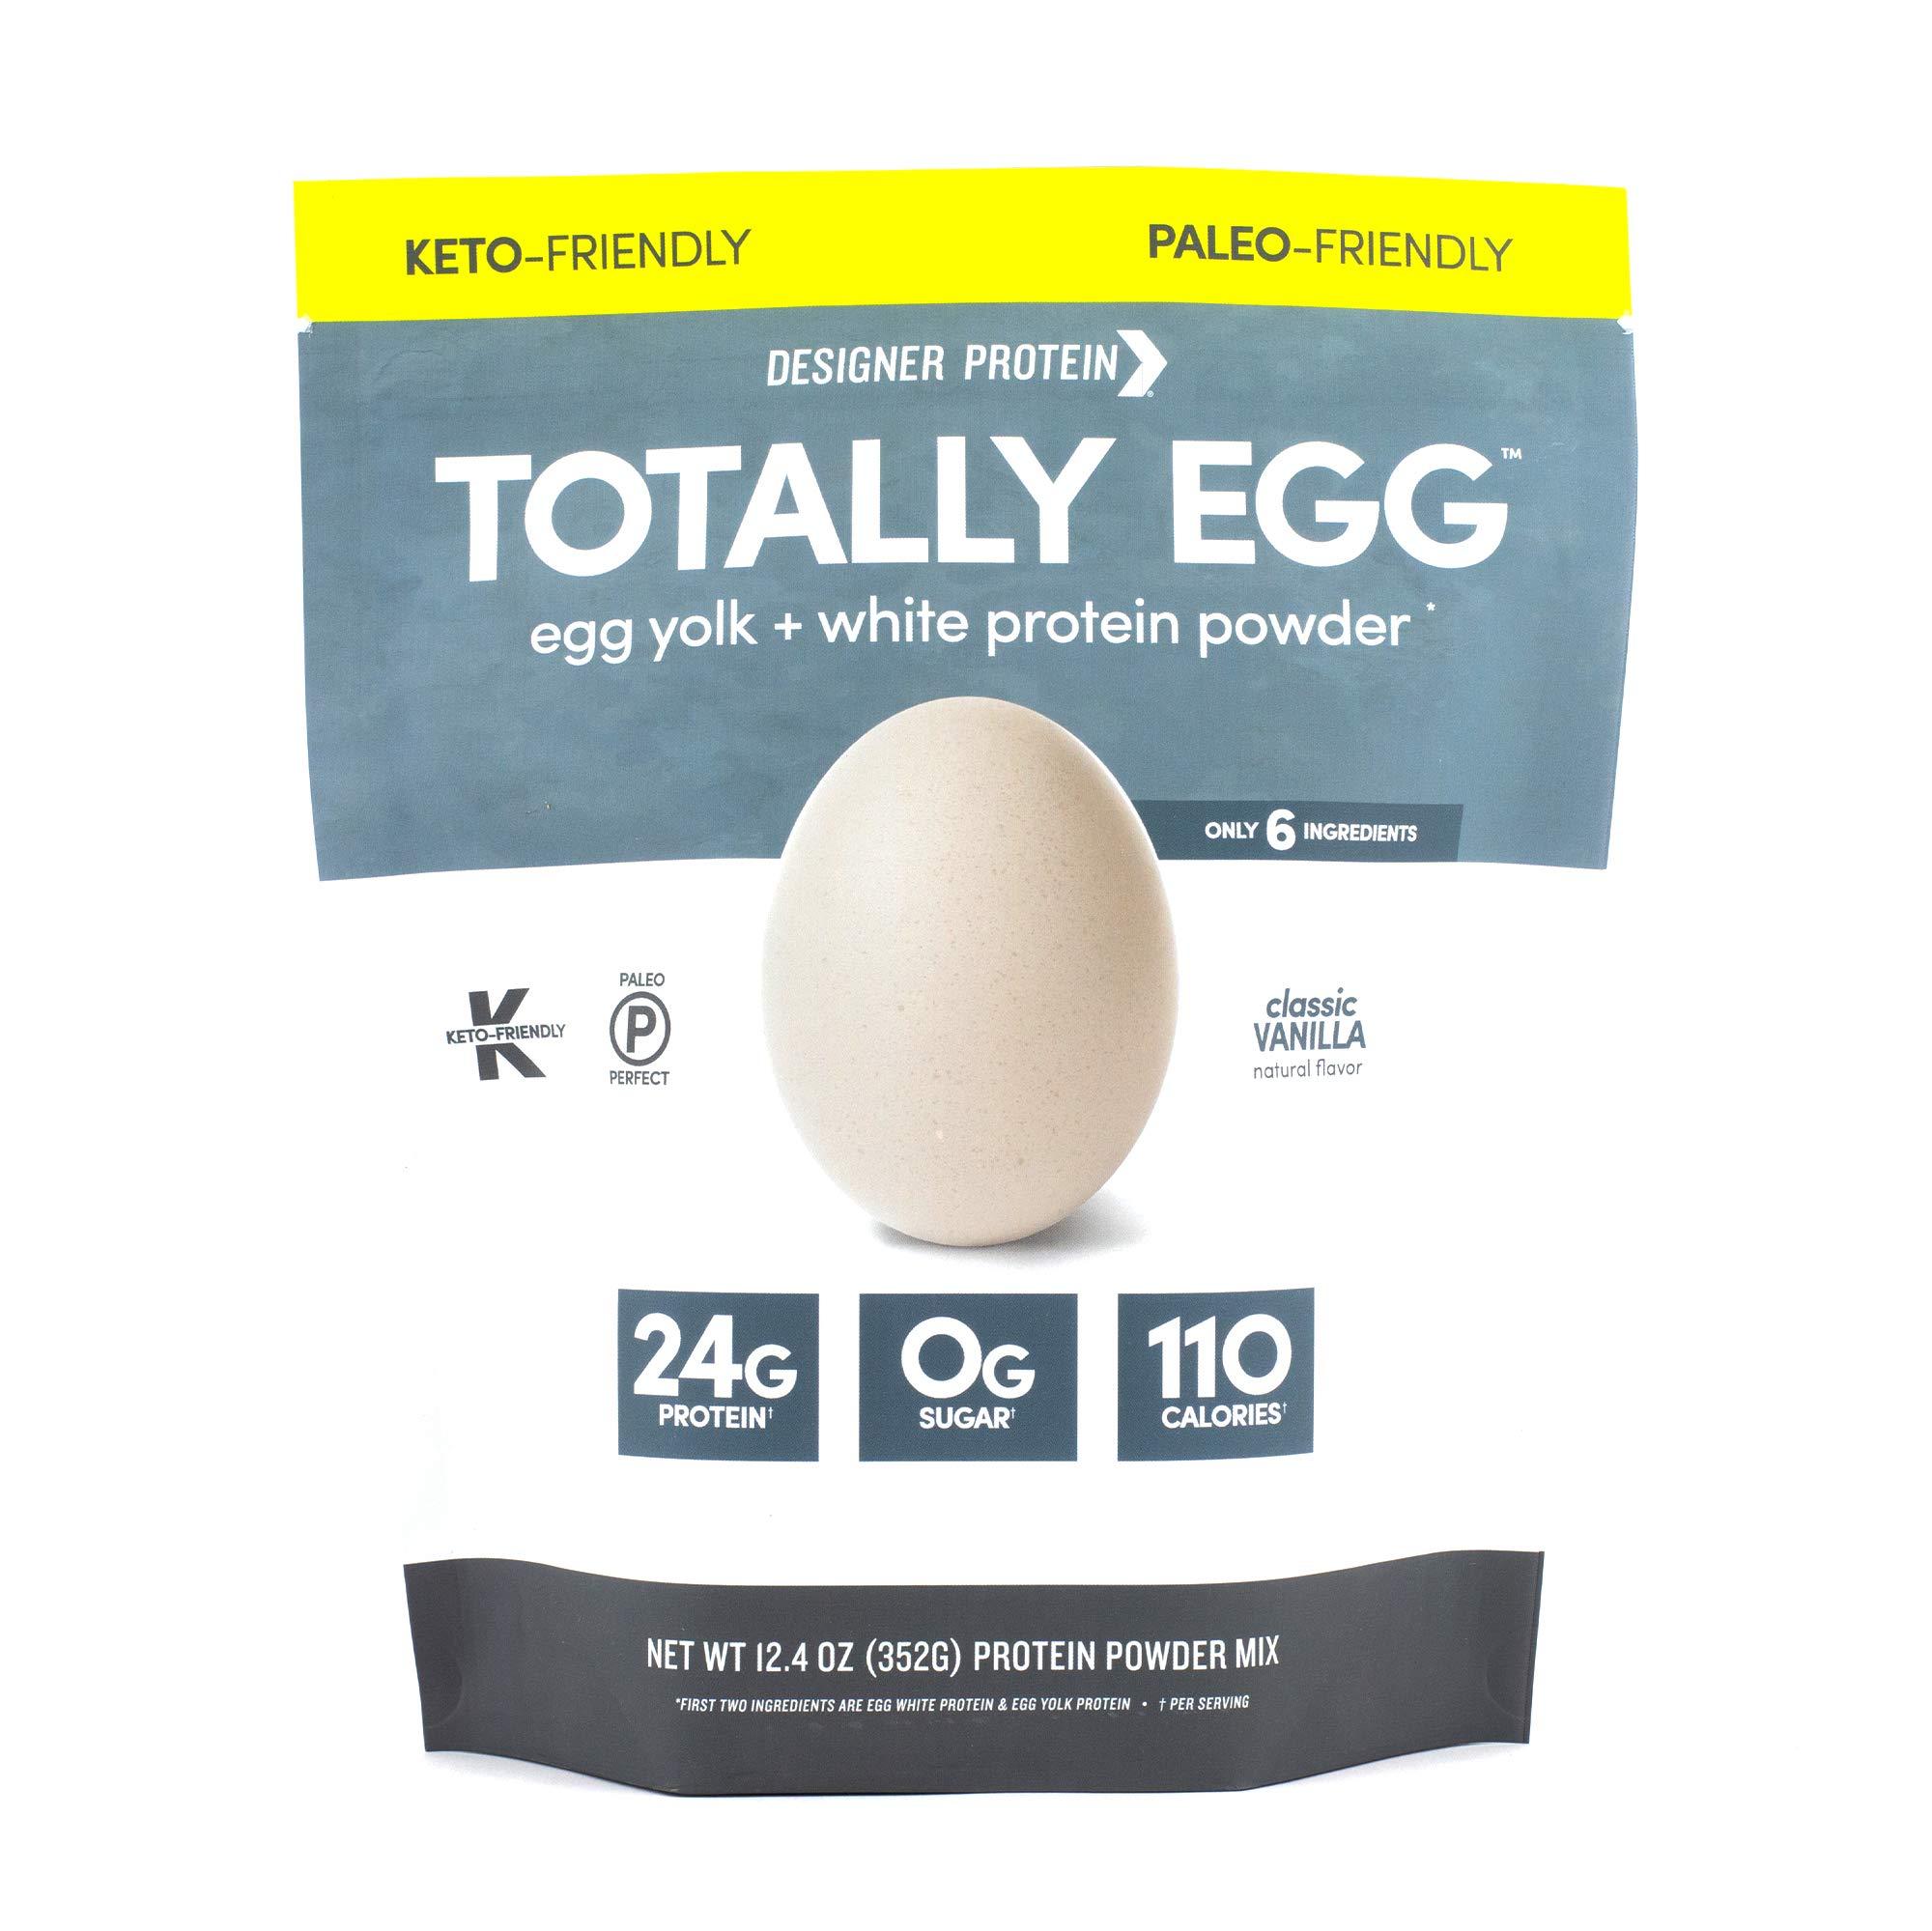 Designer Protein Totally Egg, Classic Vanilla, 12.4 Ounce, Egg White & Yolk Protein Powder by Designer Protein